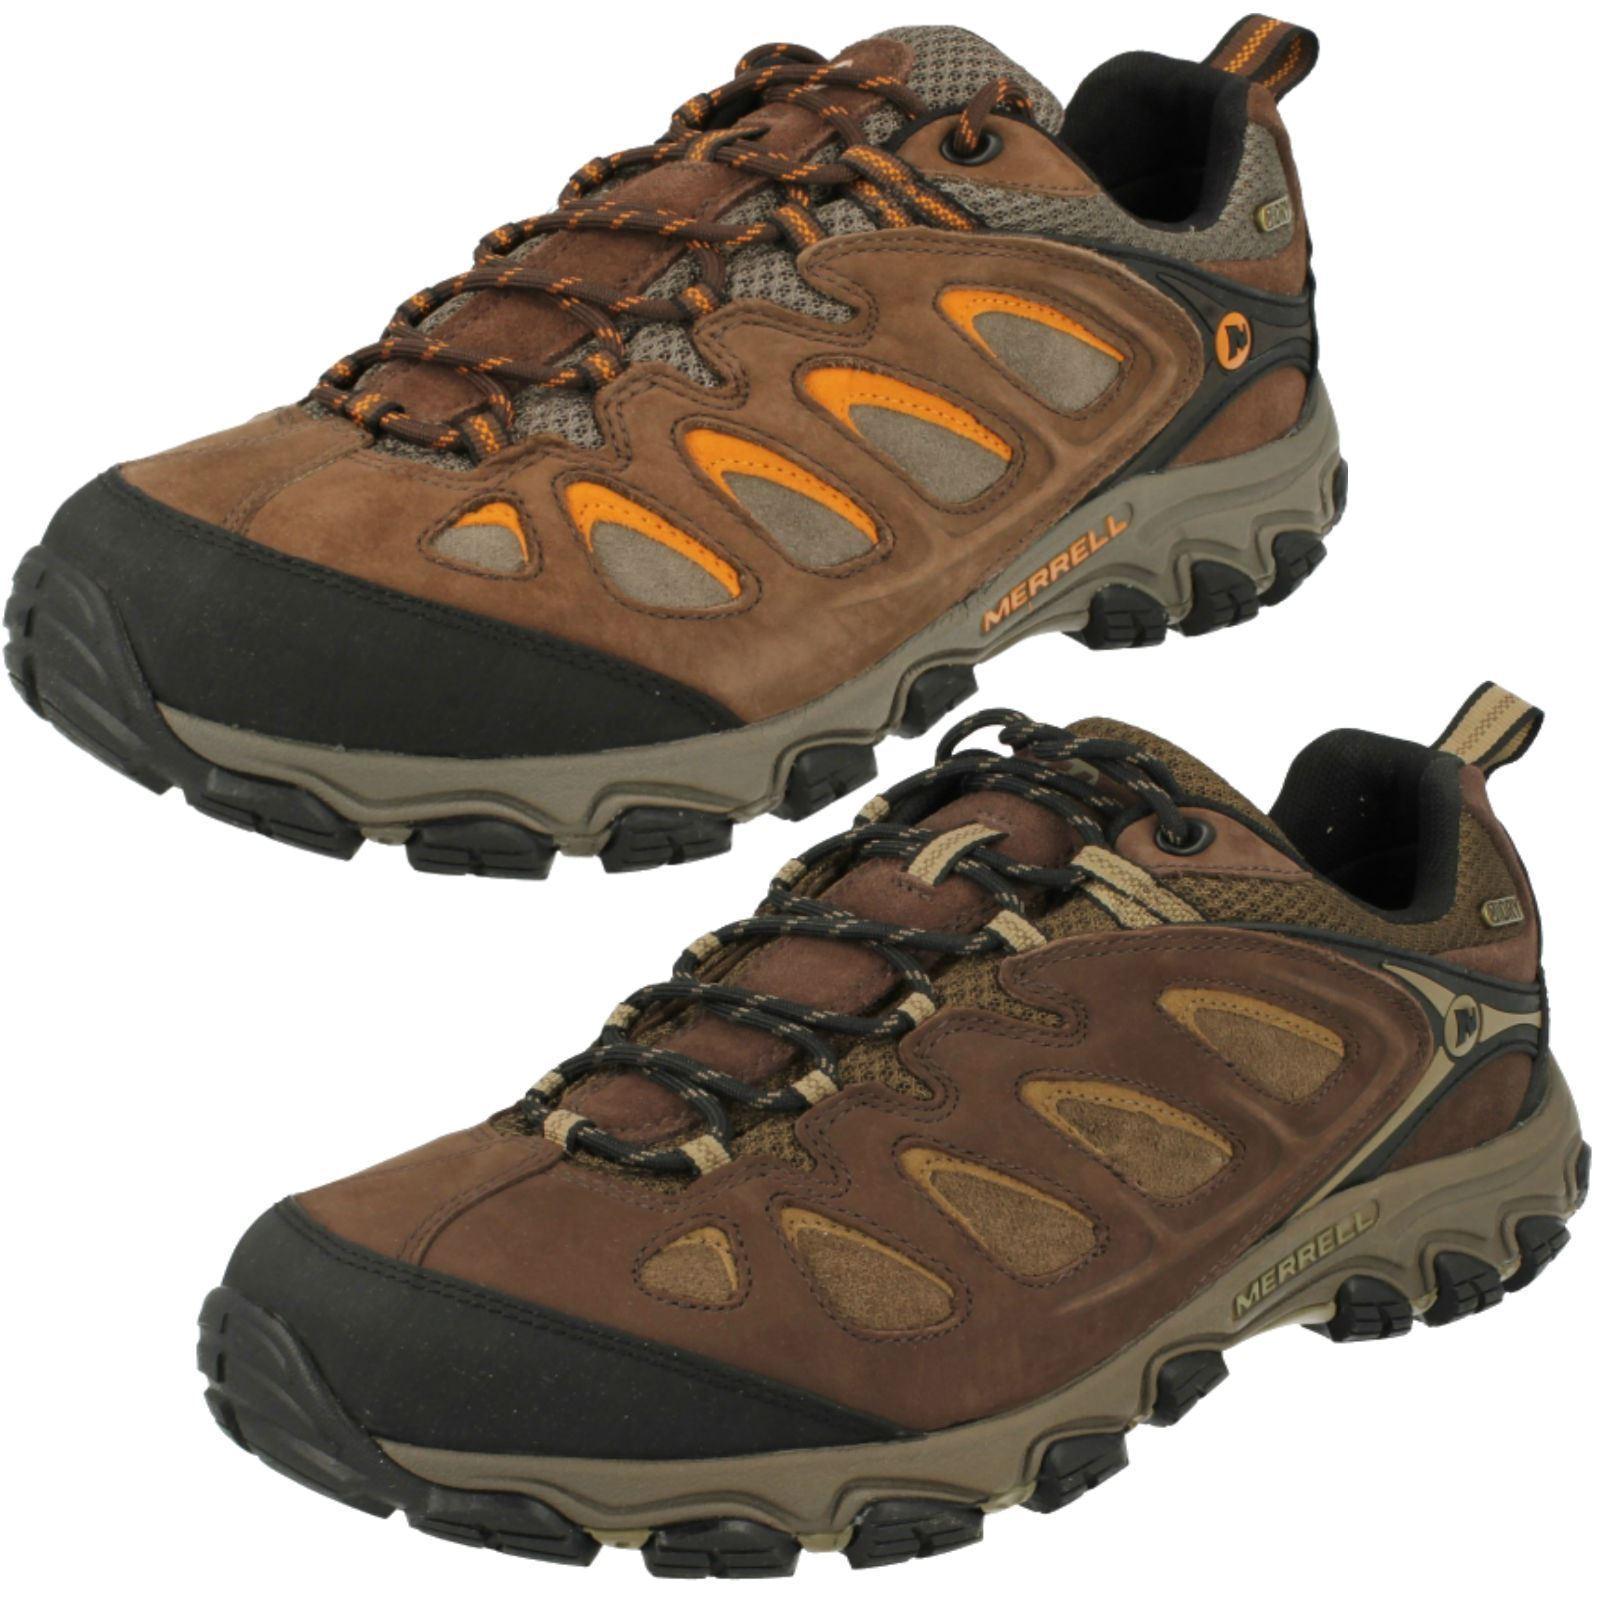 Merrell Mens Walking shoes - Pulsate Waterproof J24397